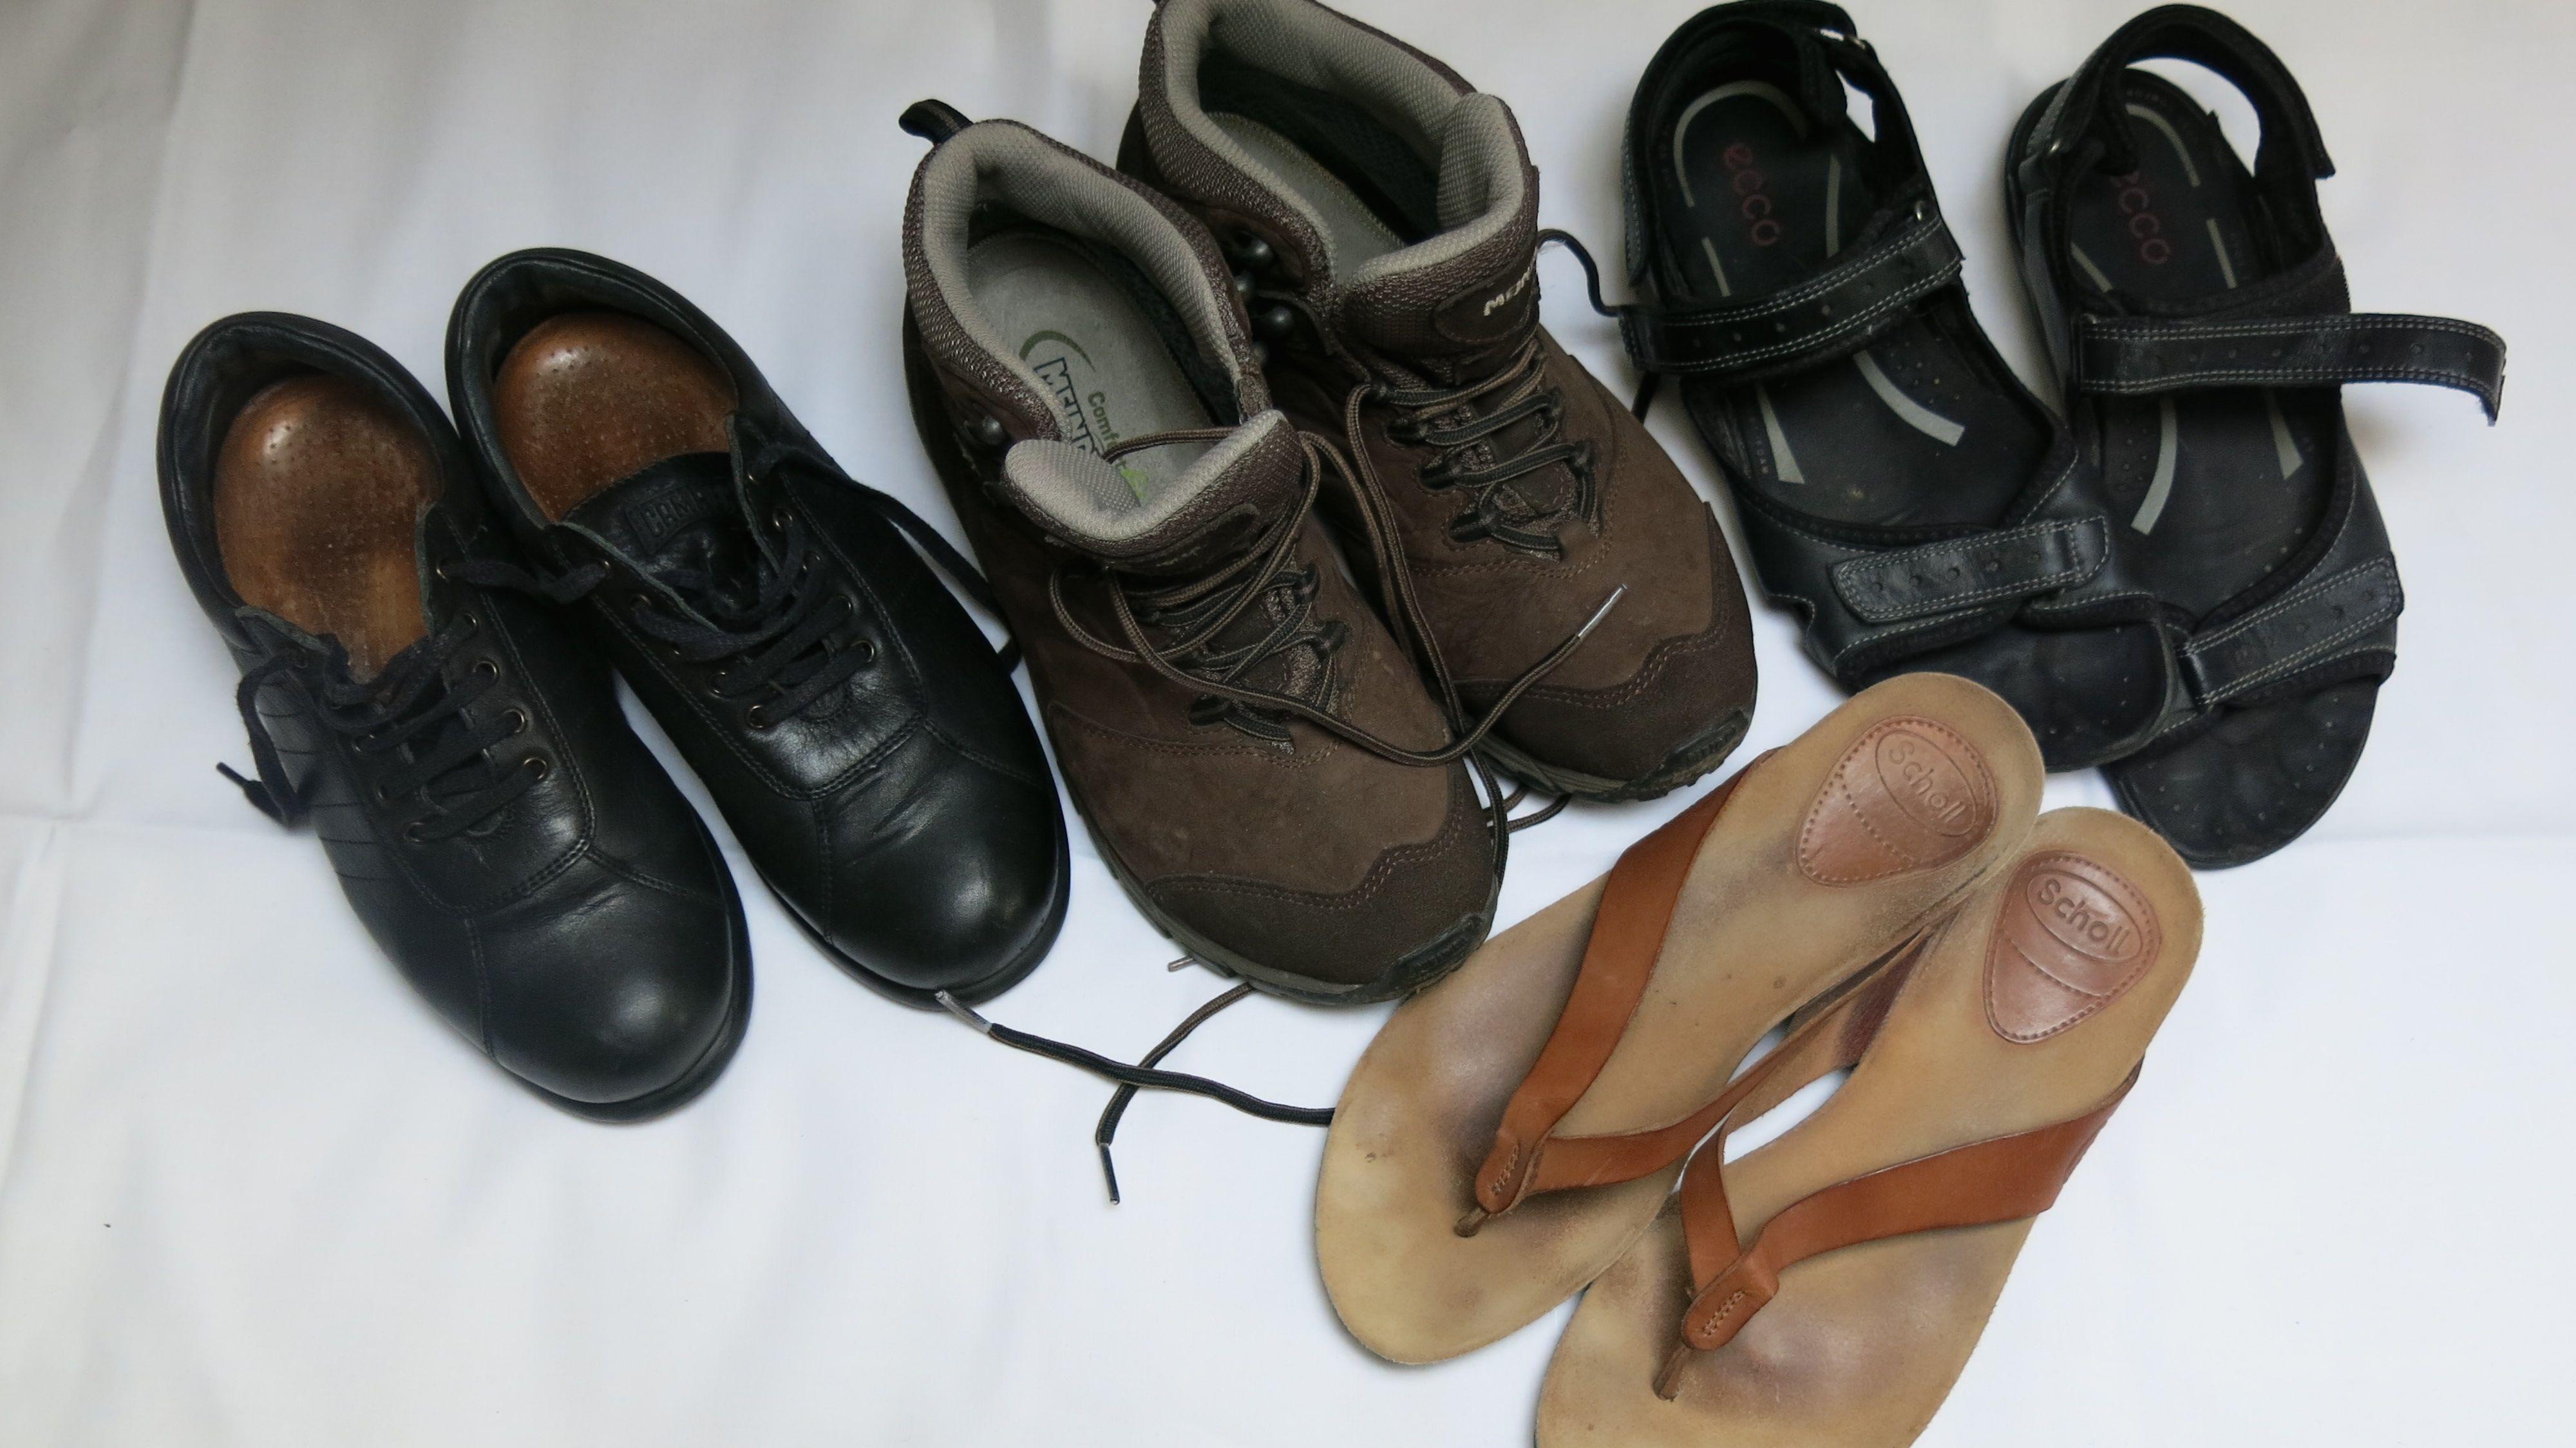 Reise 15 4 Paar Schuhe